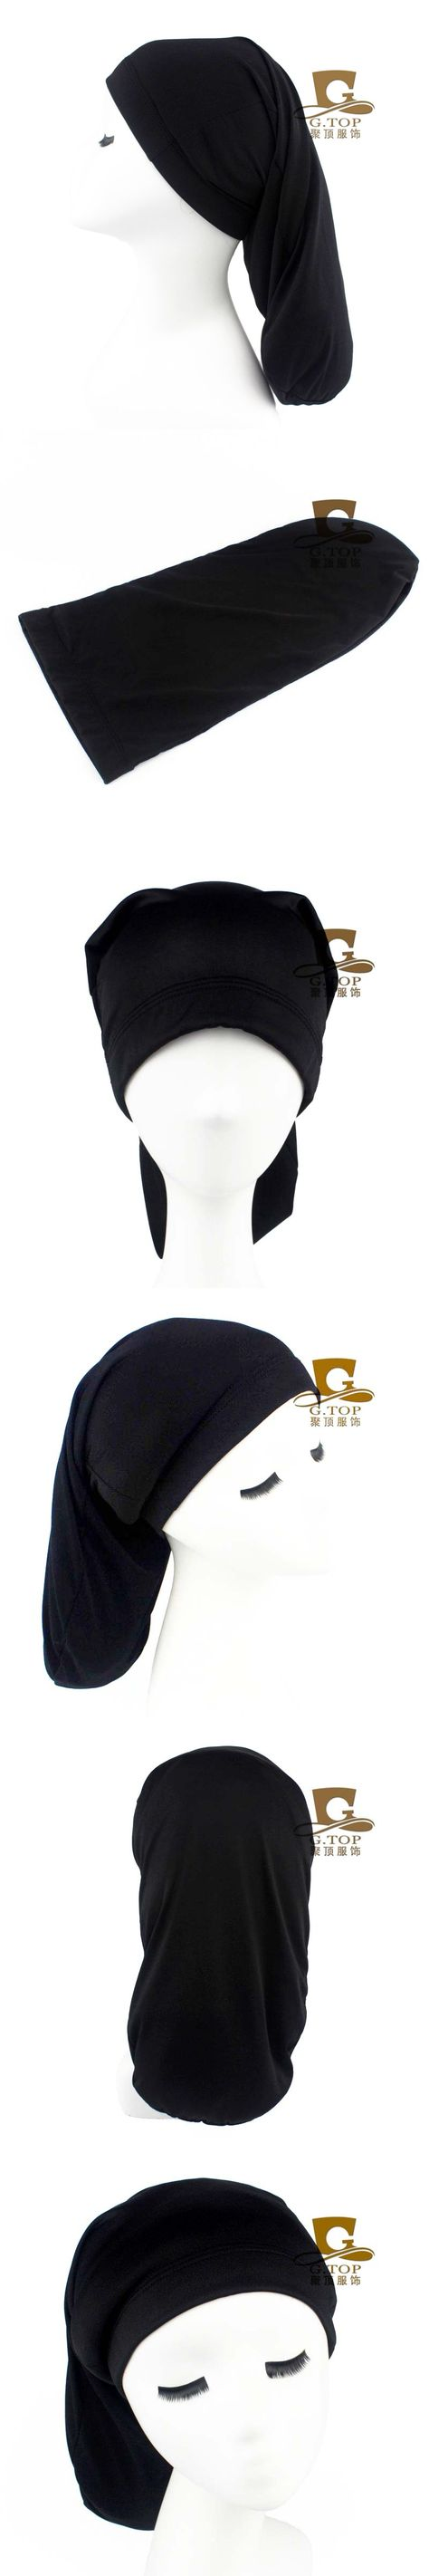 Black Spandex Strong Dreadlocks Braids Cap Beanie Hat Long Cylinder Sleep Cap